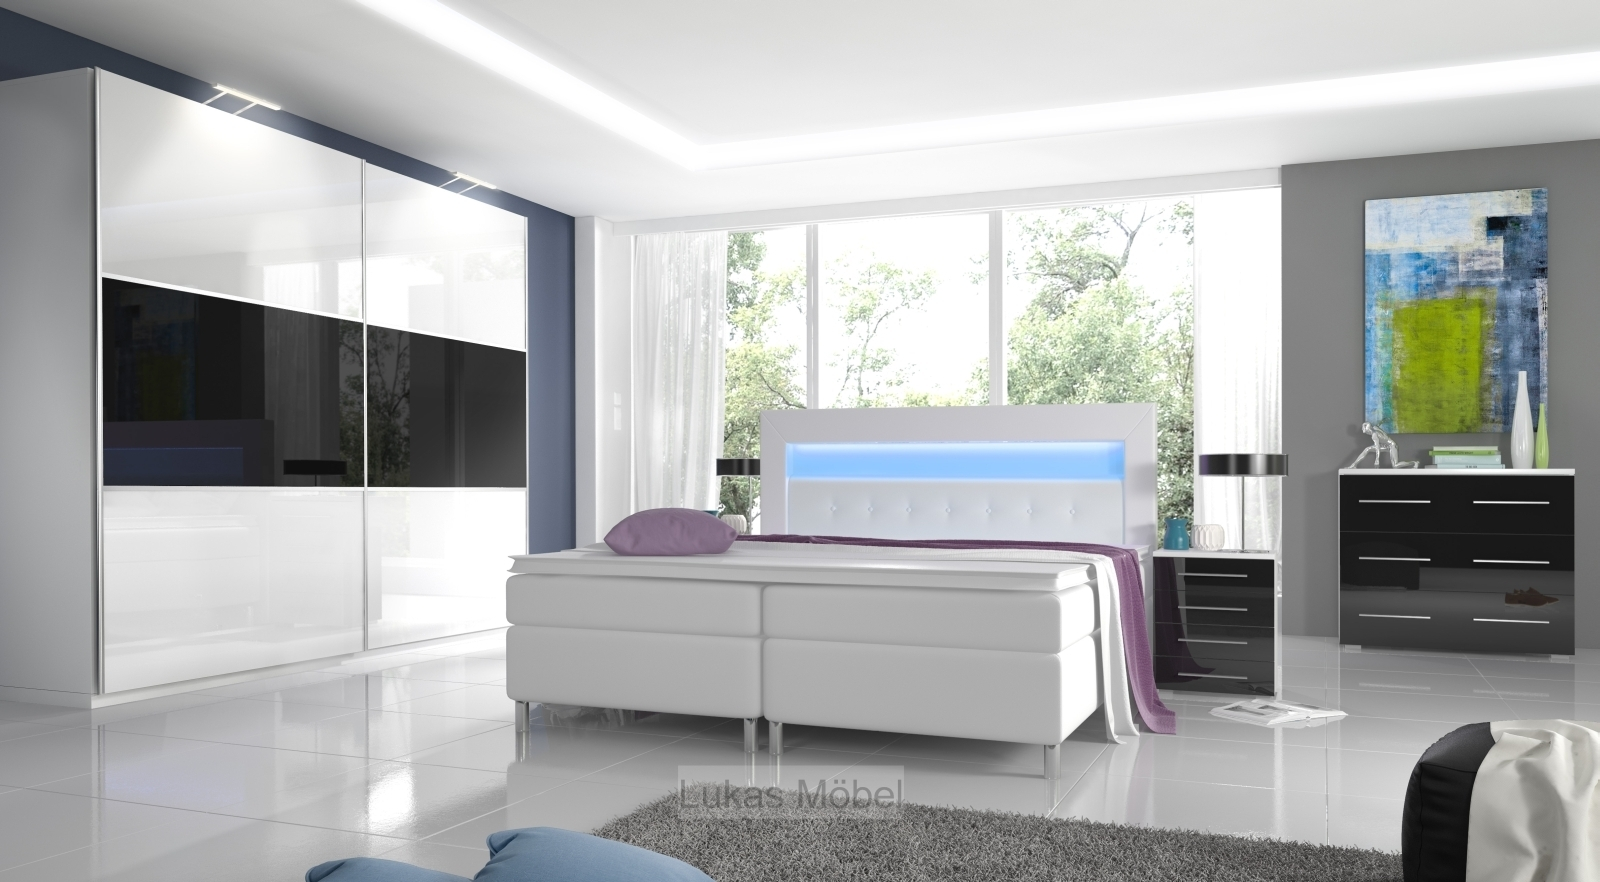 hochglanz schlafzimmer rivaled. Black Bedroom Furniture Sets. Home Design Ideas